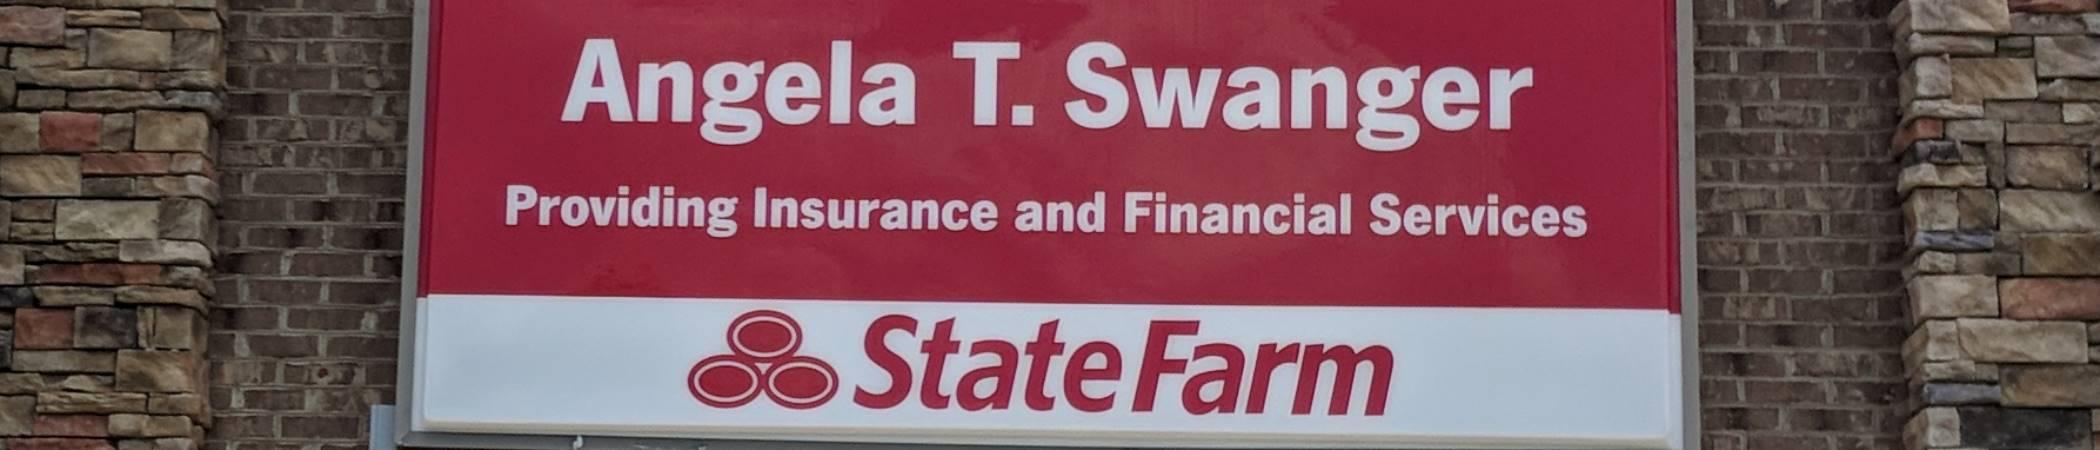 Angela Swanger State Farm Insurance in Mebane, NC | Home, Auto Insurance & more